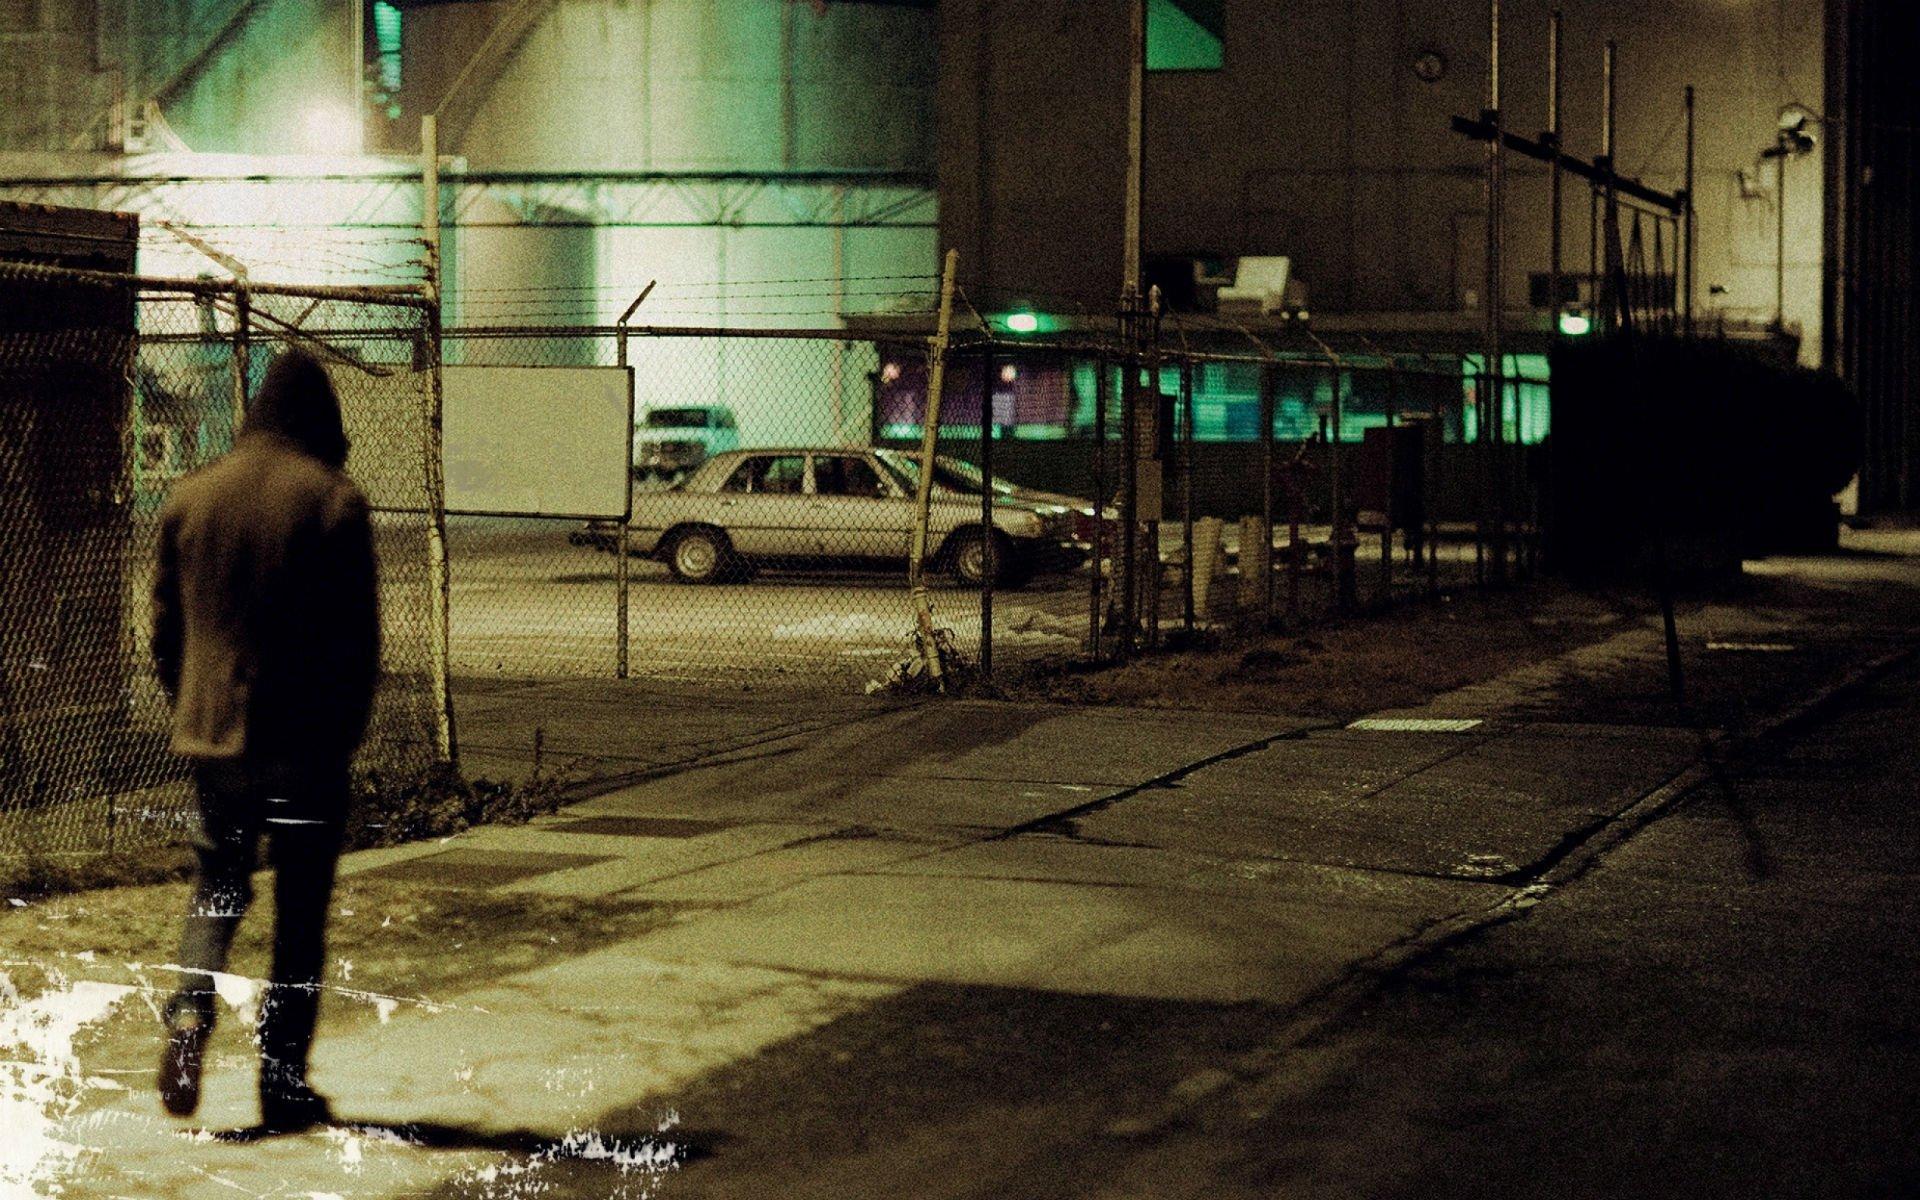 Wallpaper 1920x1200 Px Alone Boy Emotion Loneliness